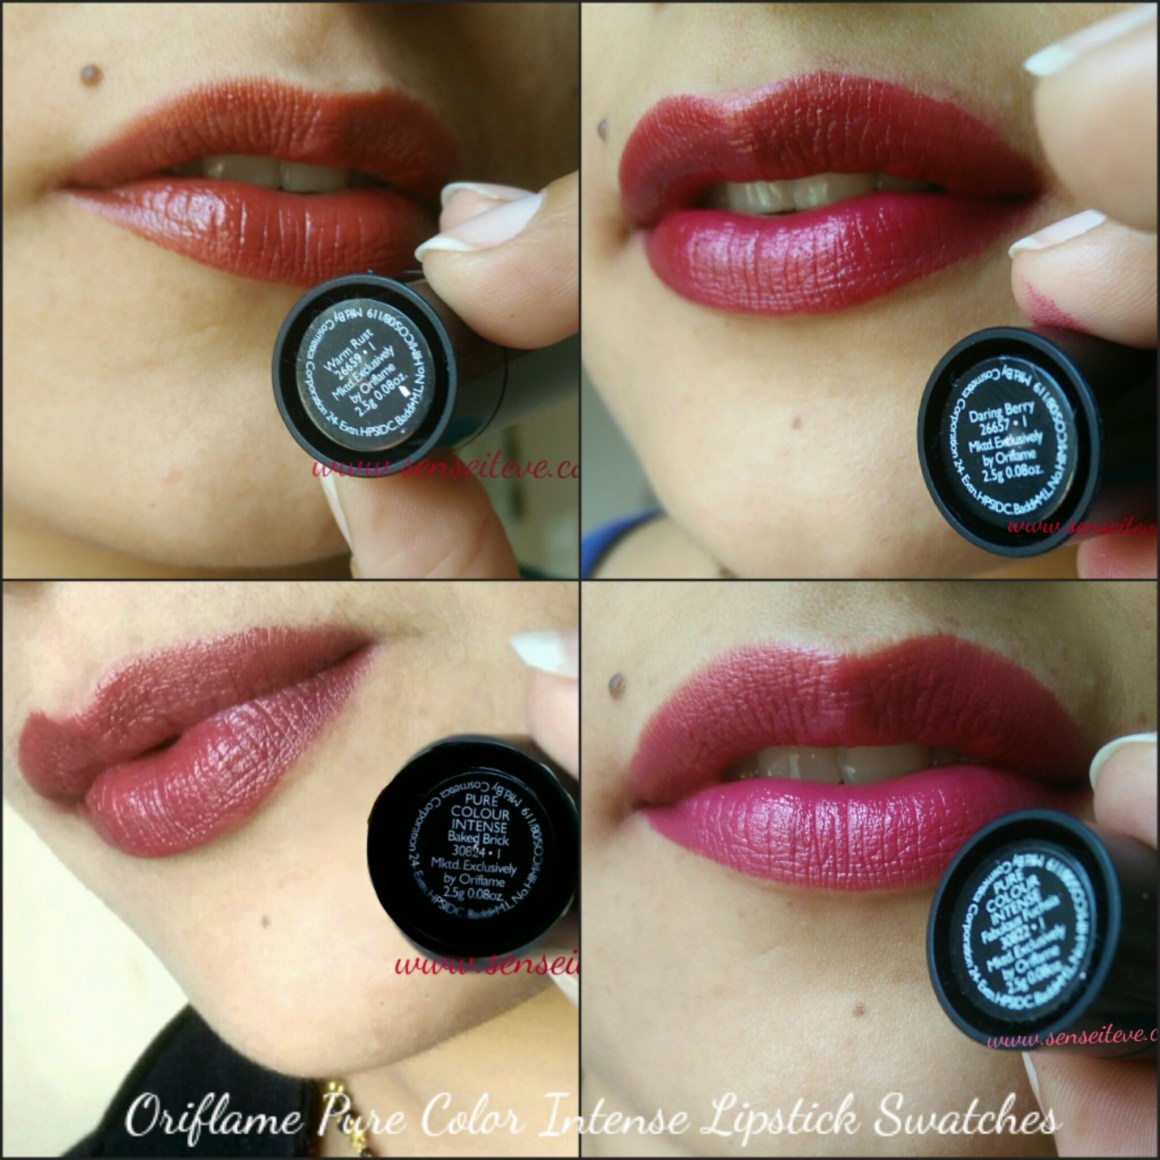 Oriflame Pure Color Intense Lipsticks Warm Rust, Daring Berry, Baked Brick, Fabulous Fuschia Swatches